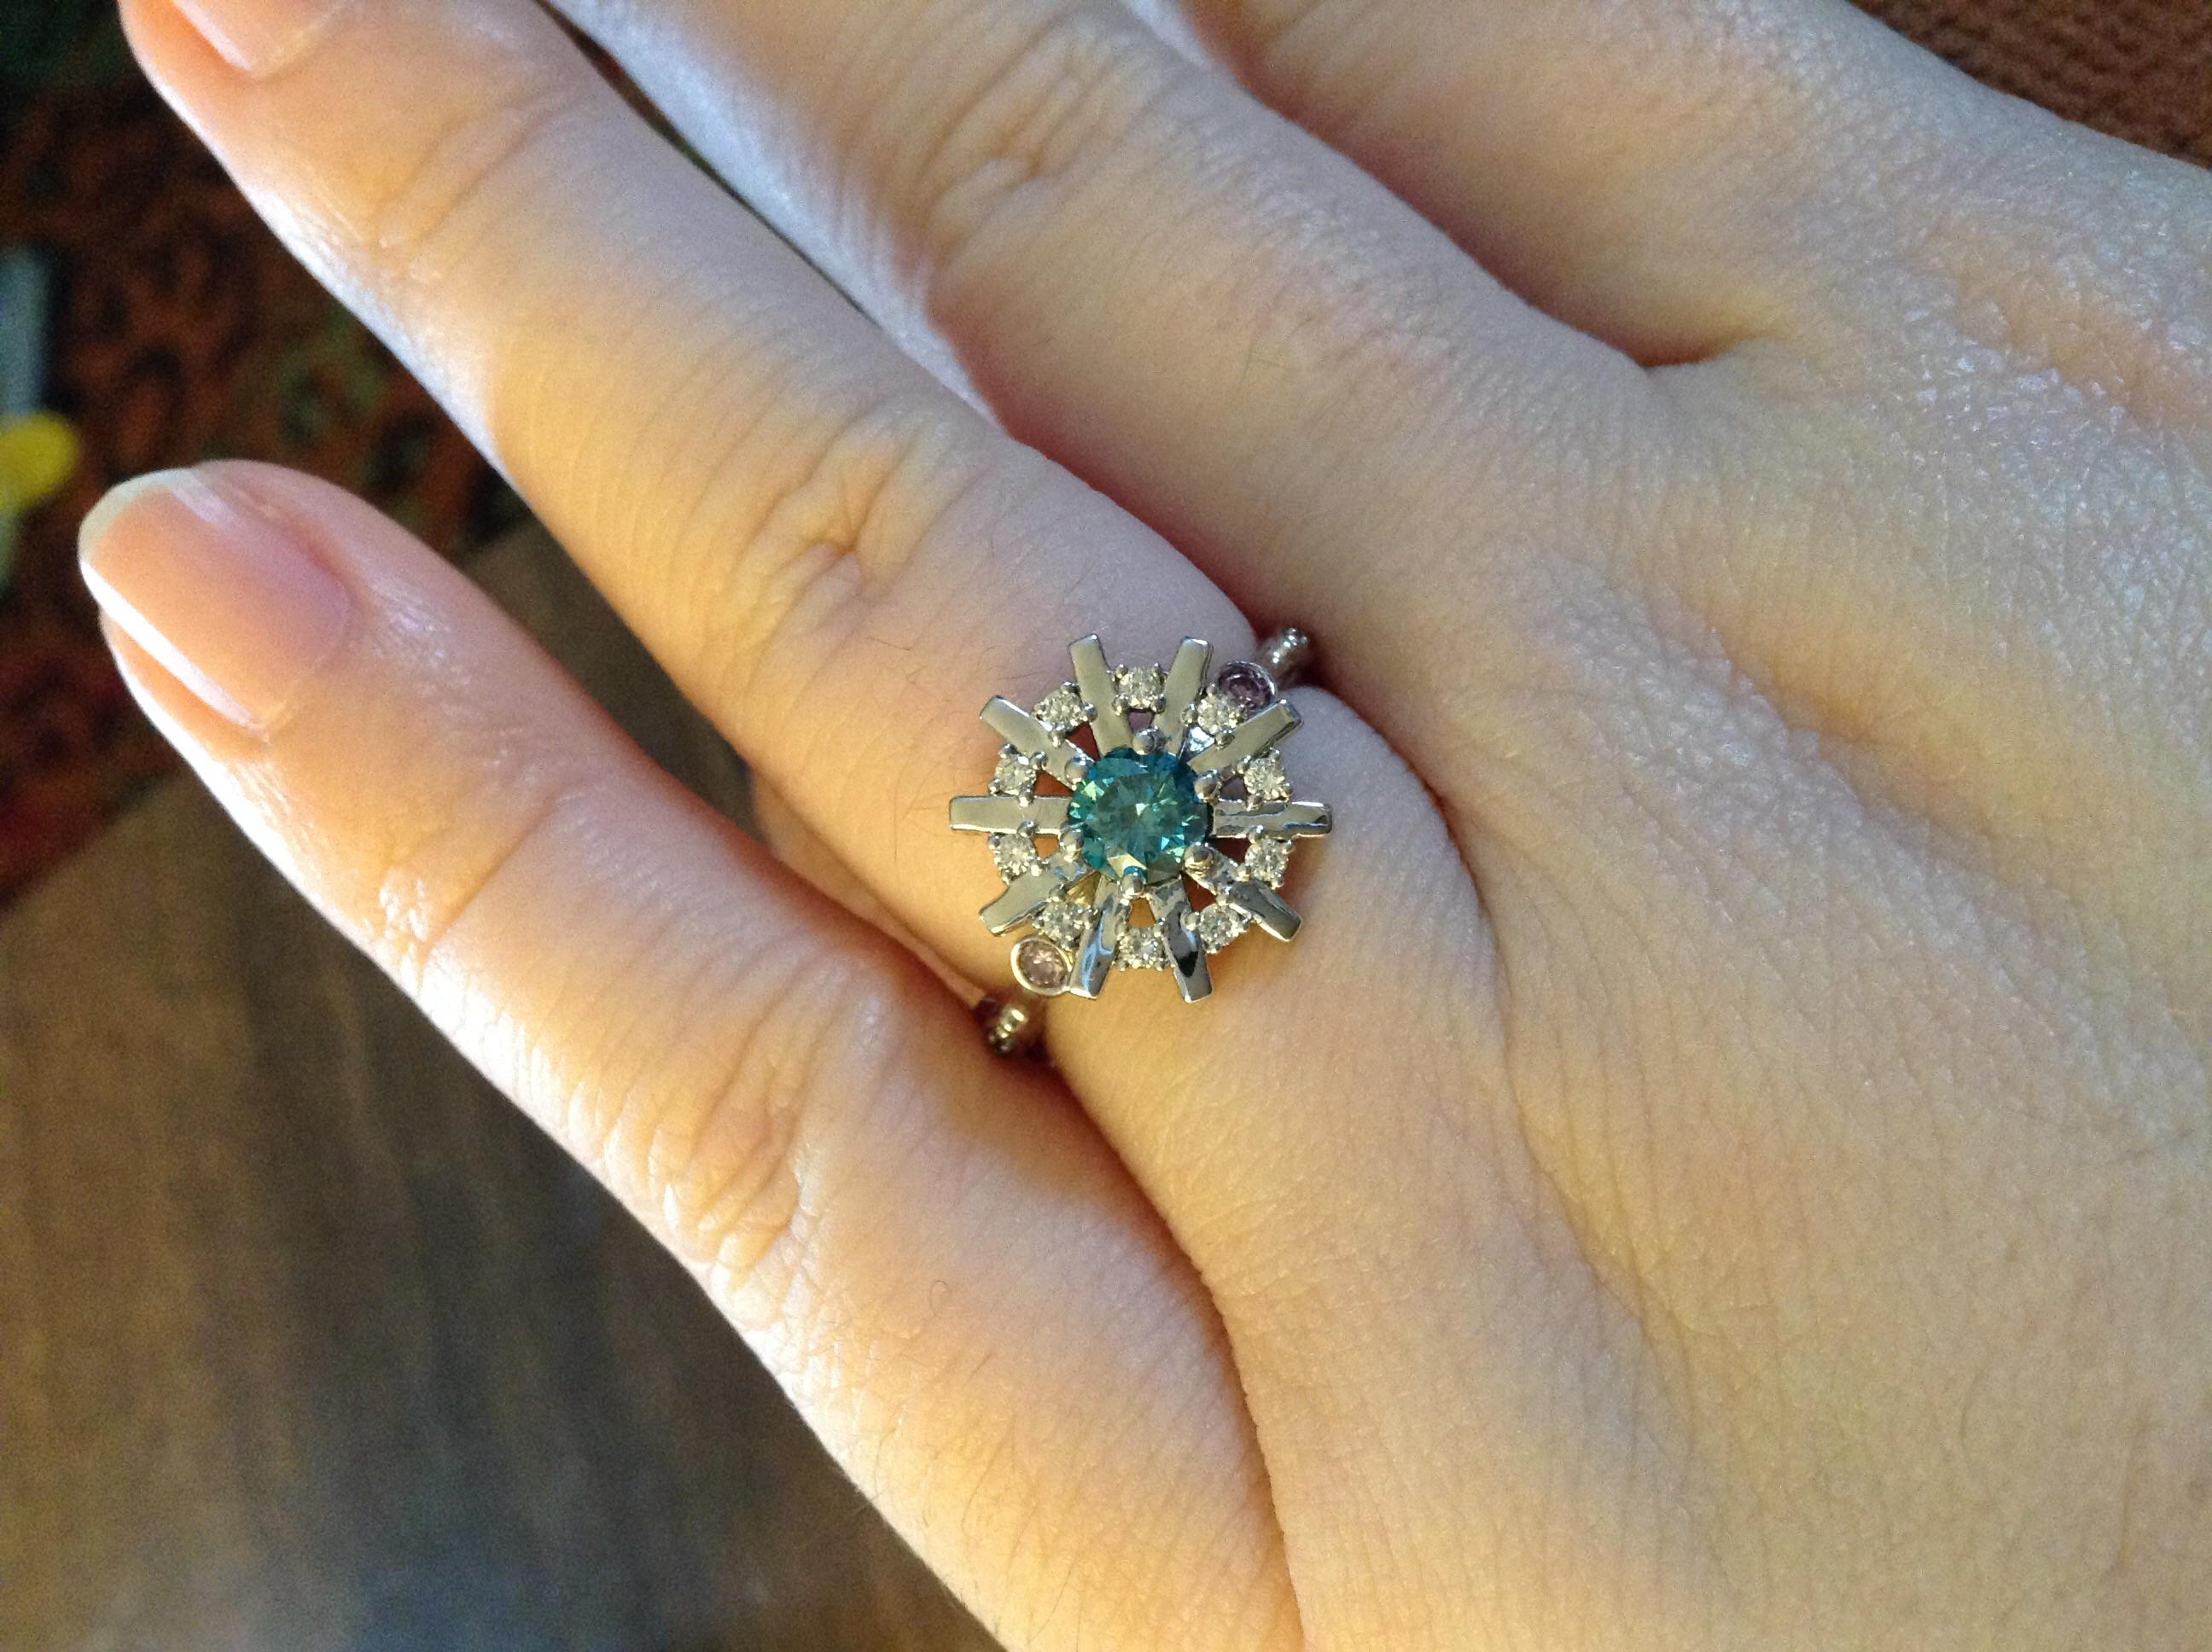 kaymacys or local retailer for engagement rings jareds wedding rings Post 9